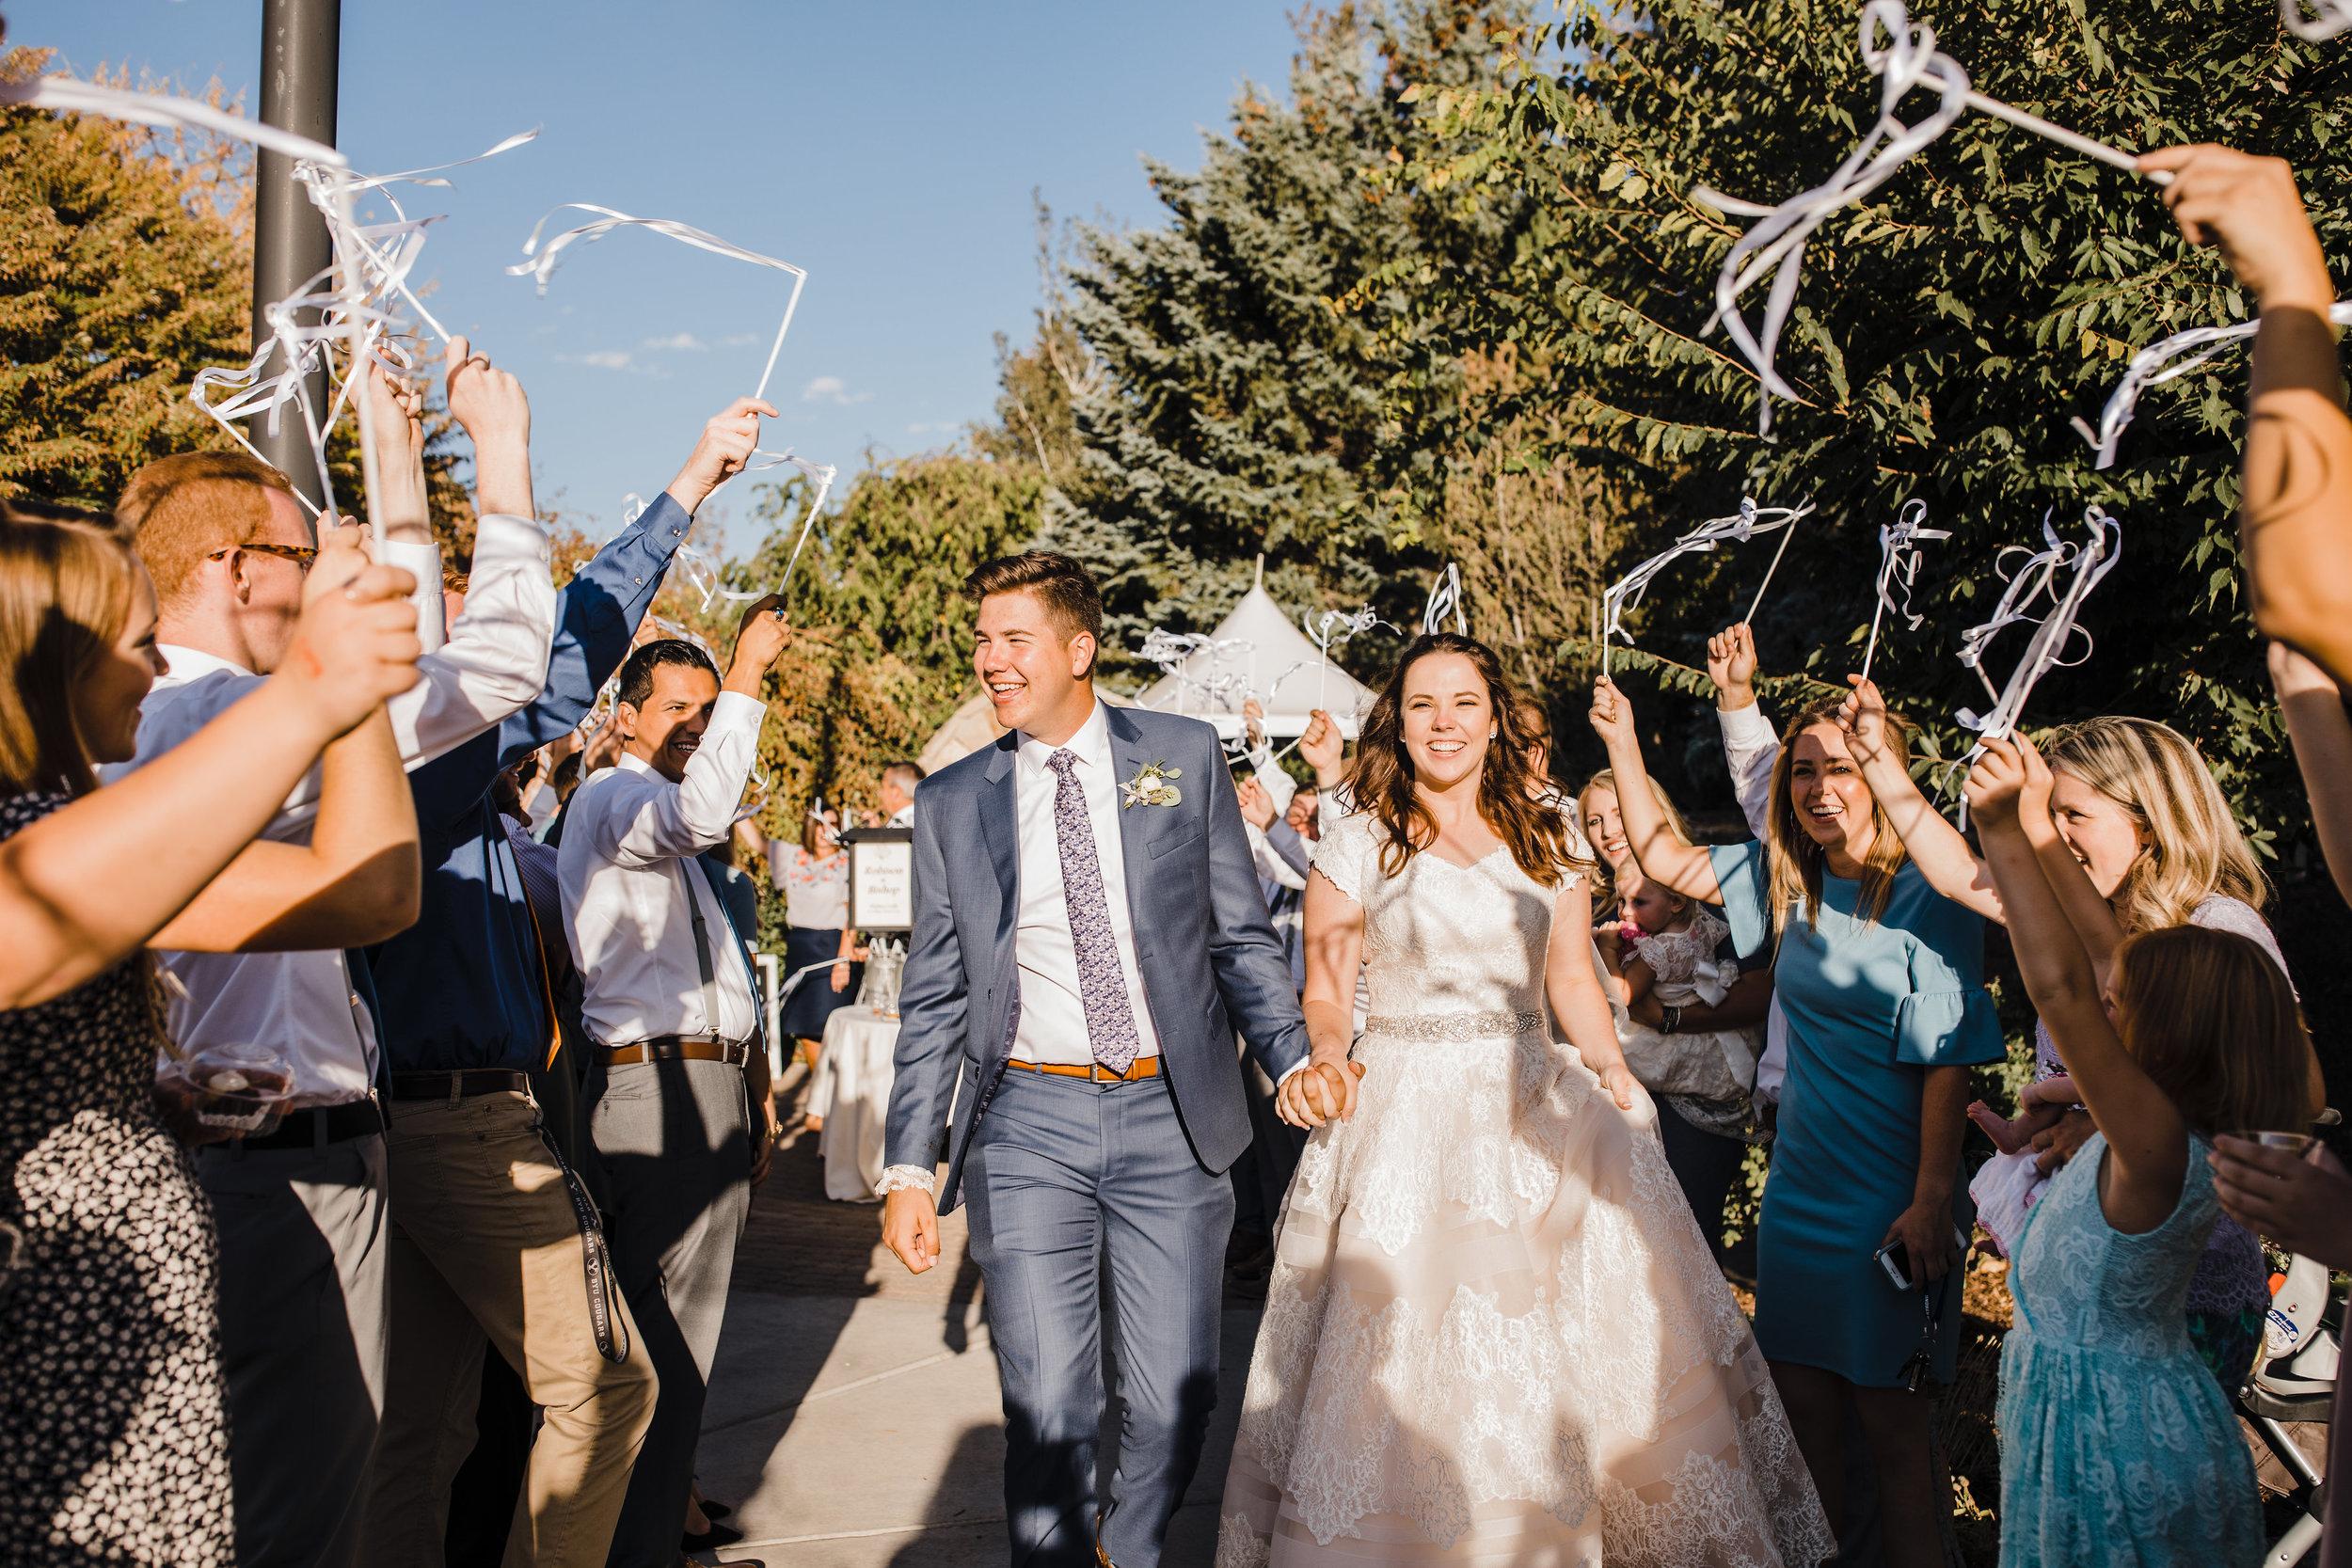 provo utah wedding photographer wedding exit streamers cheering happy